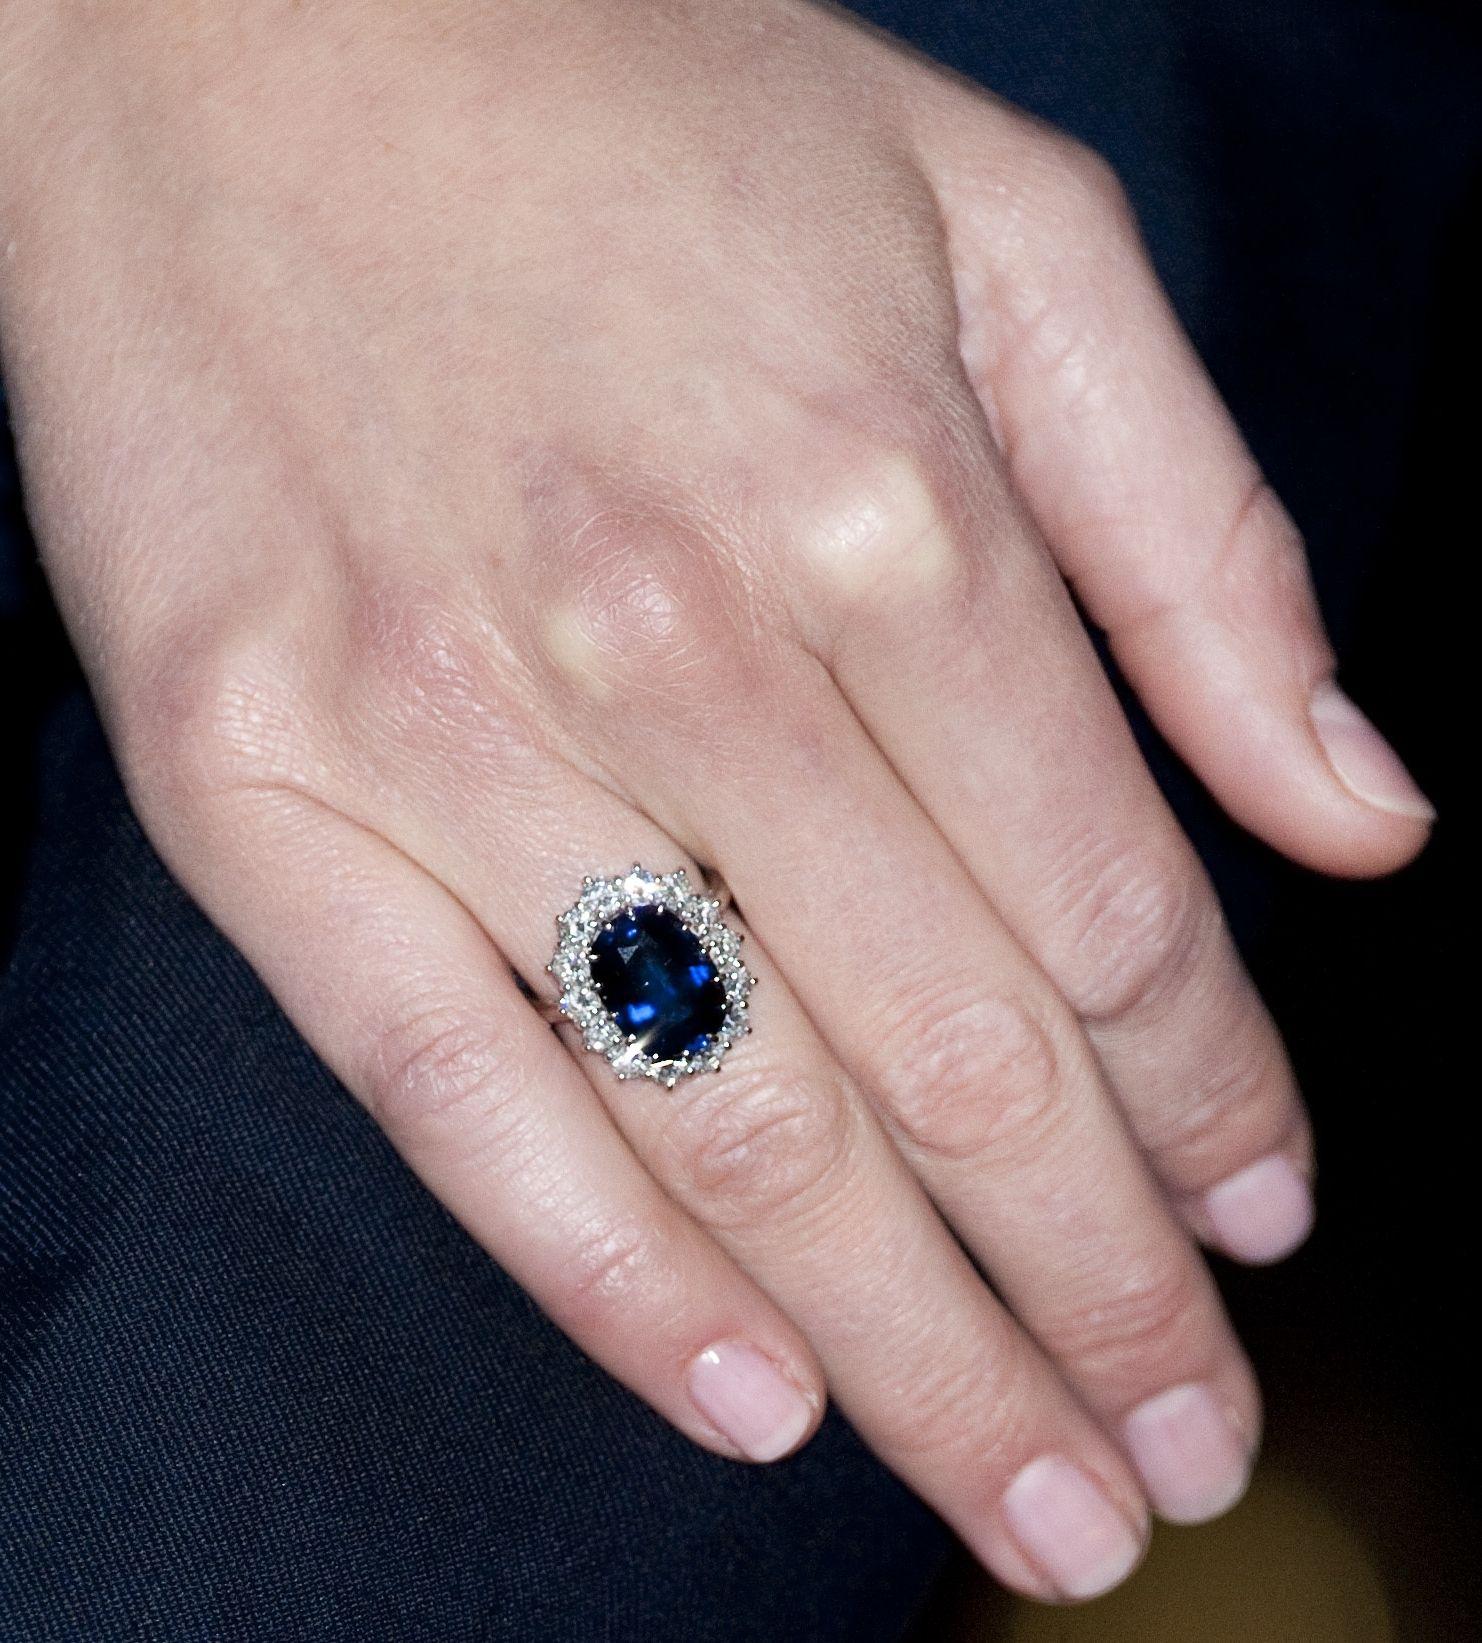 12 Carat Oval Ceylon Sapphire And Diamond Engagement Ring Diamond Engagement Rings Engagement Rings Rings